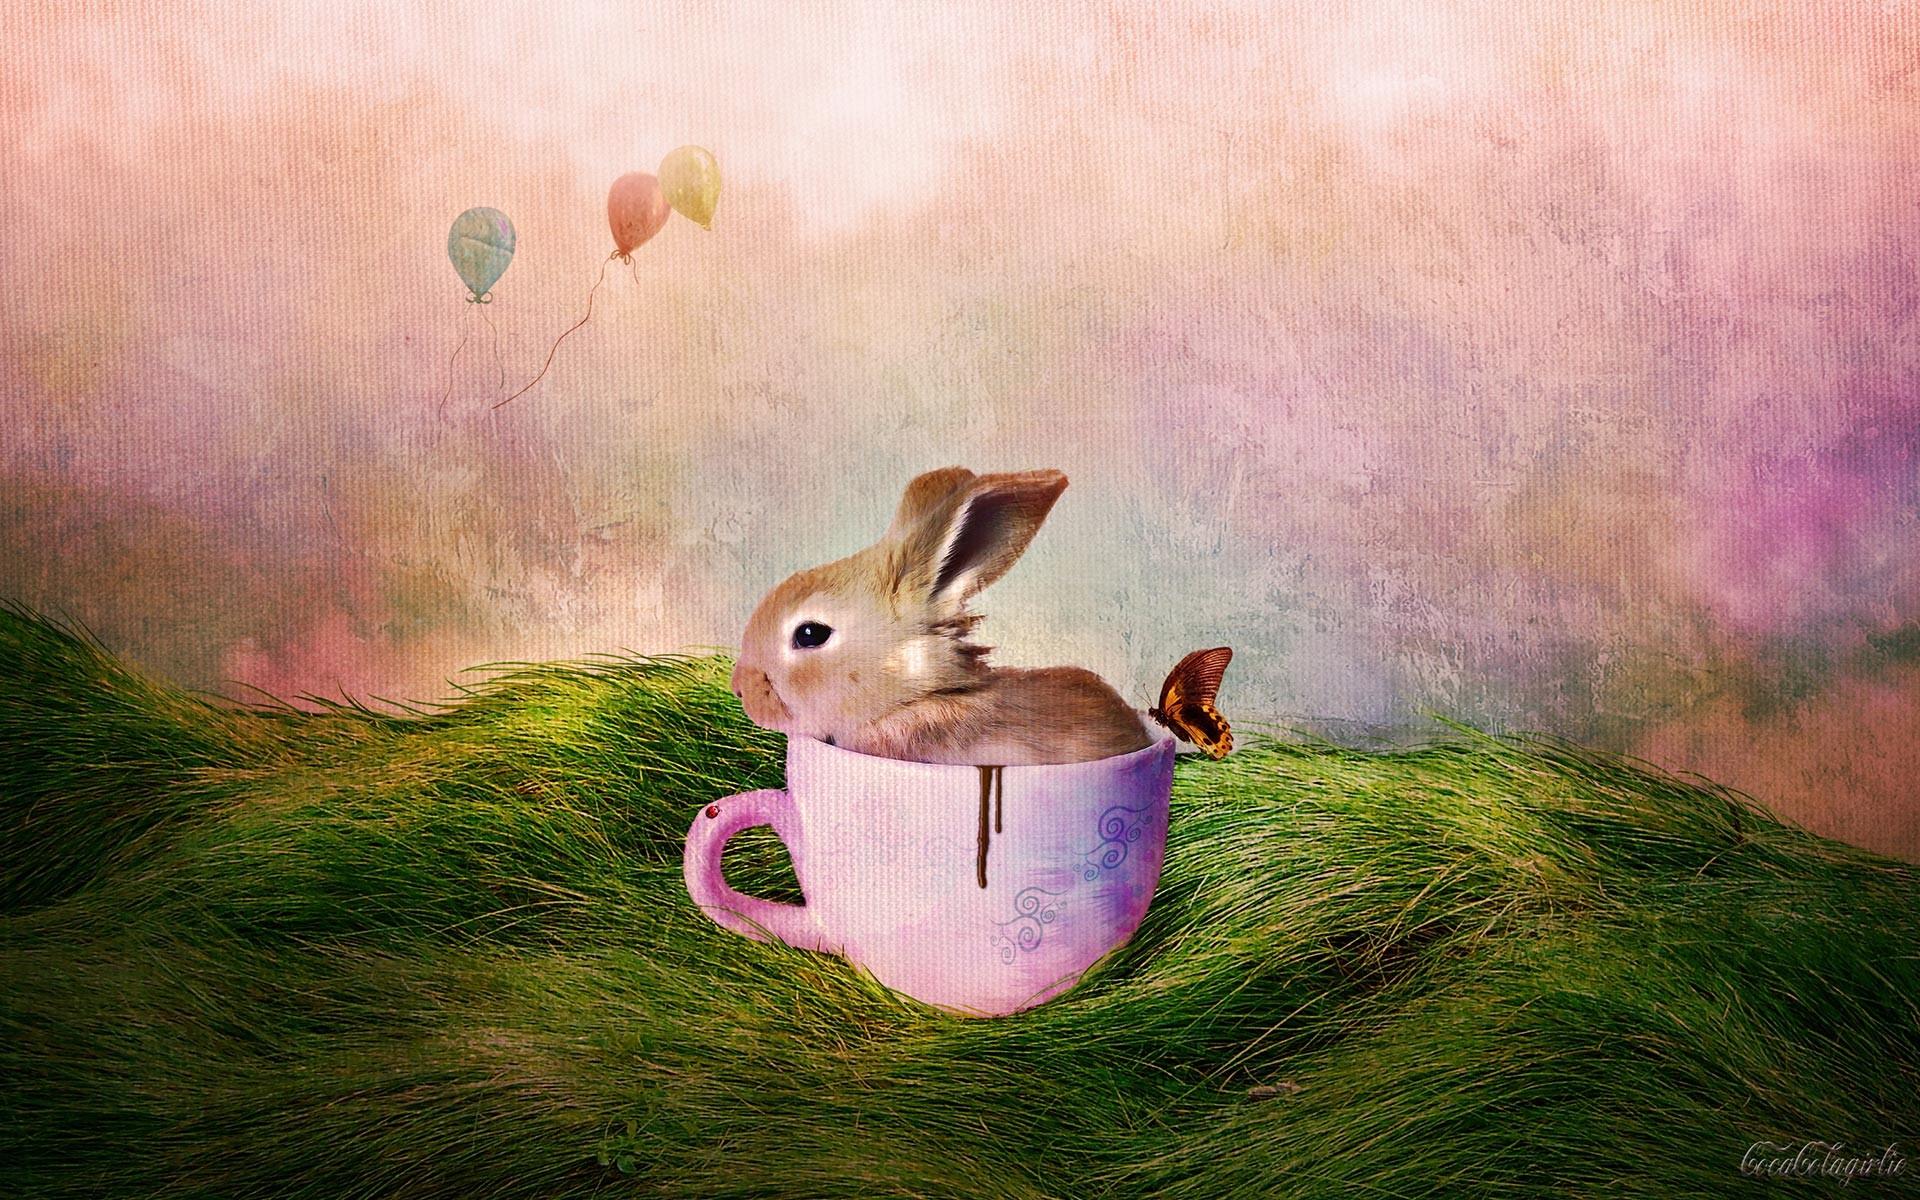 Easter Bunny wallpaper. Resolution: 1920×1200